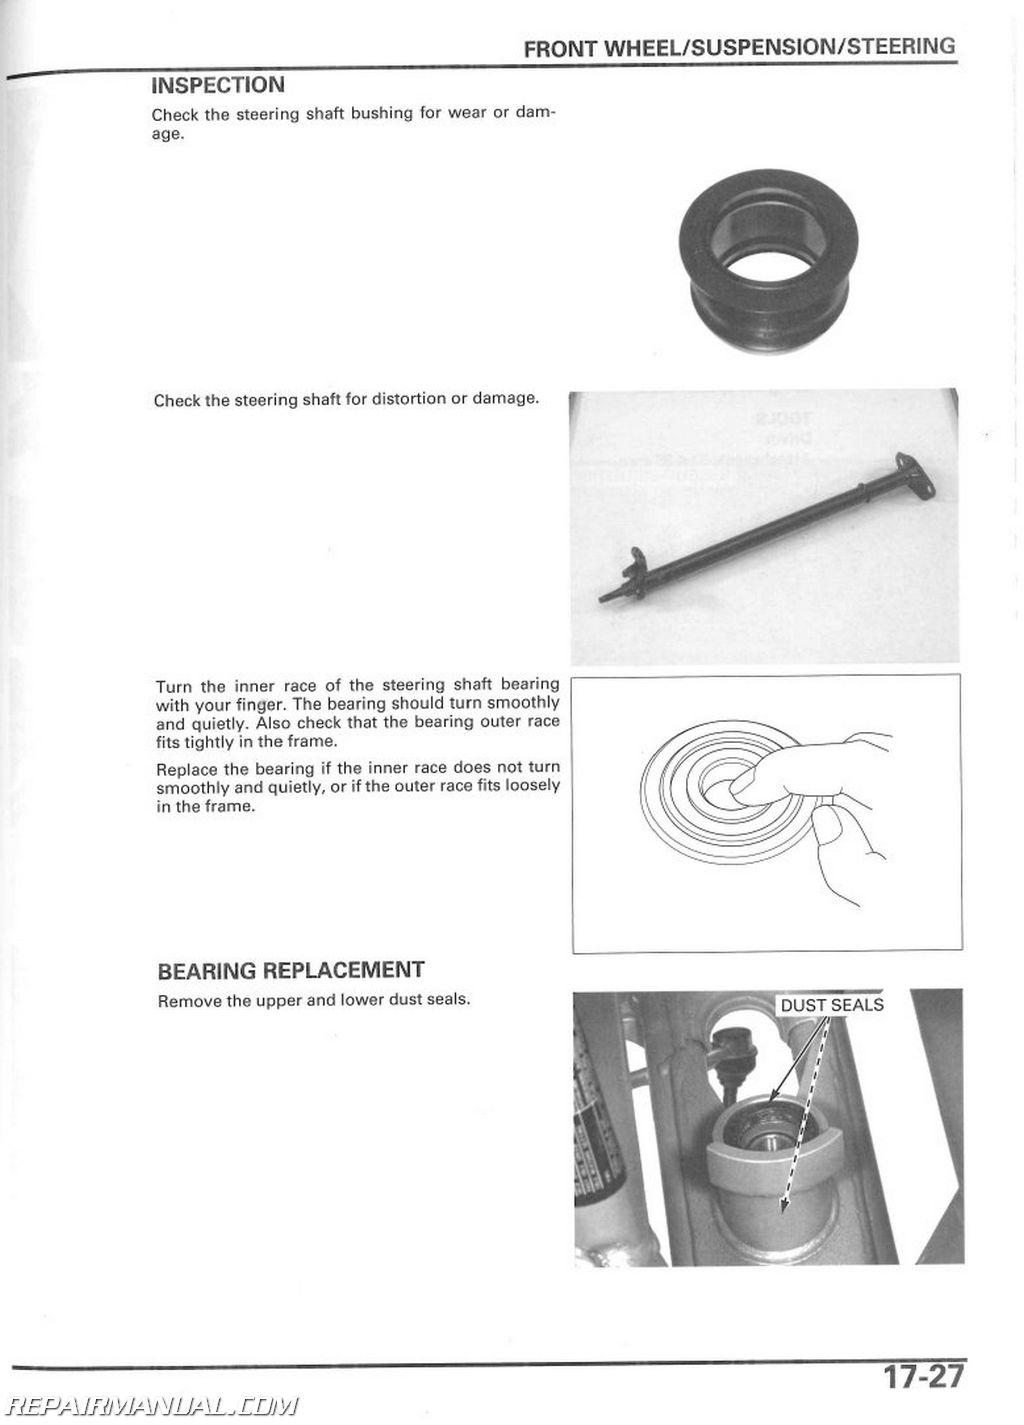 hight resolution of honda trx 450r wiring diagram wiring library rh 8 skriptoase de 2005 honda trx450r wiring diagram 2006 honda trx450r wiring diagram